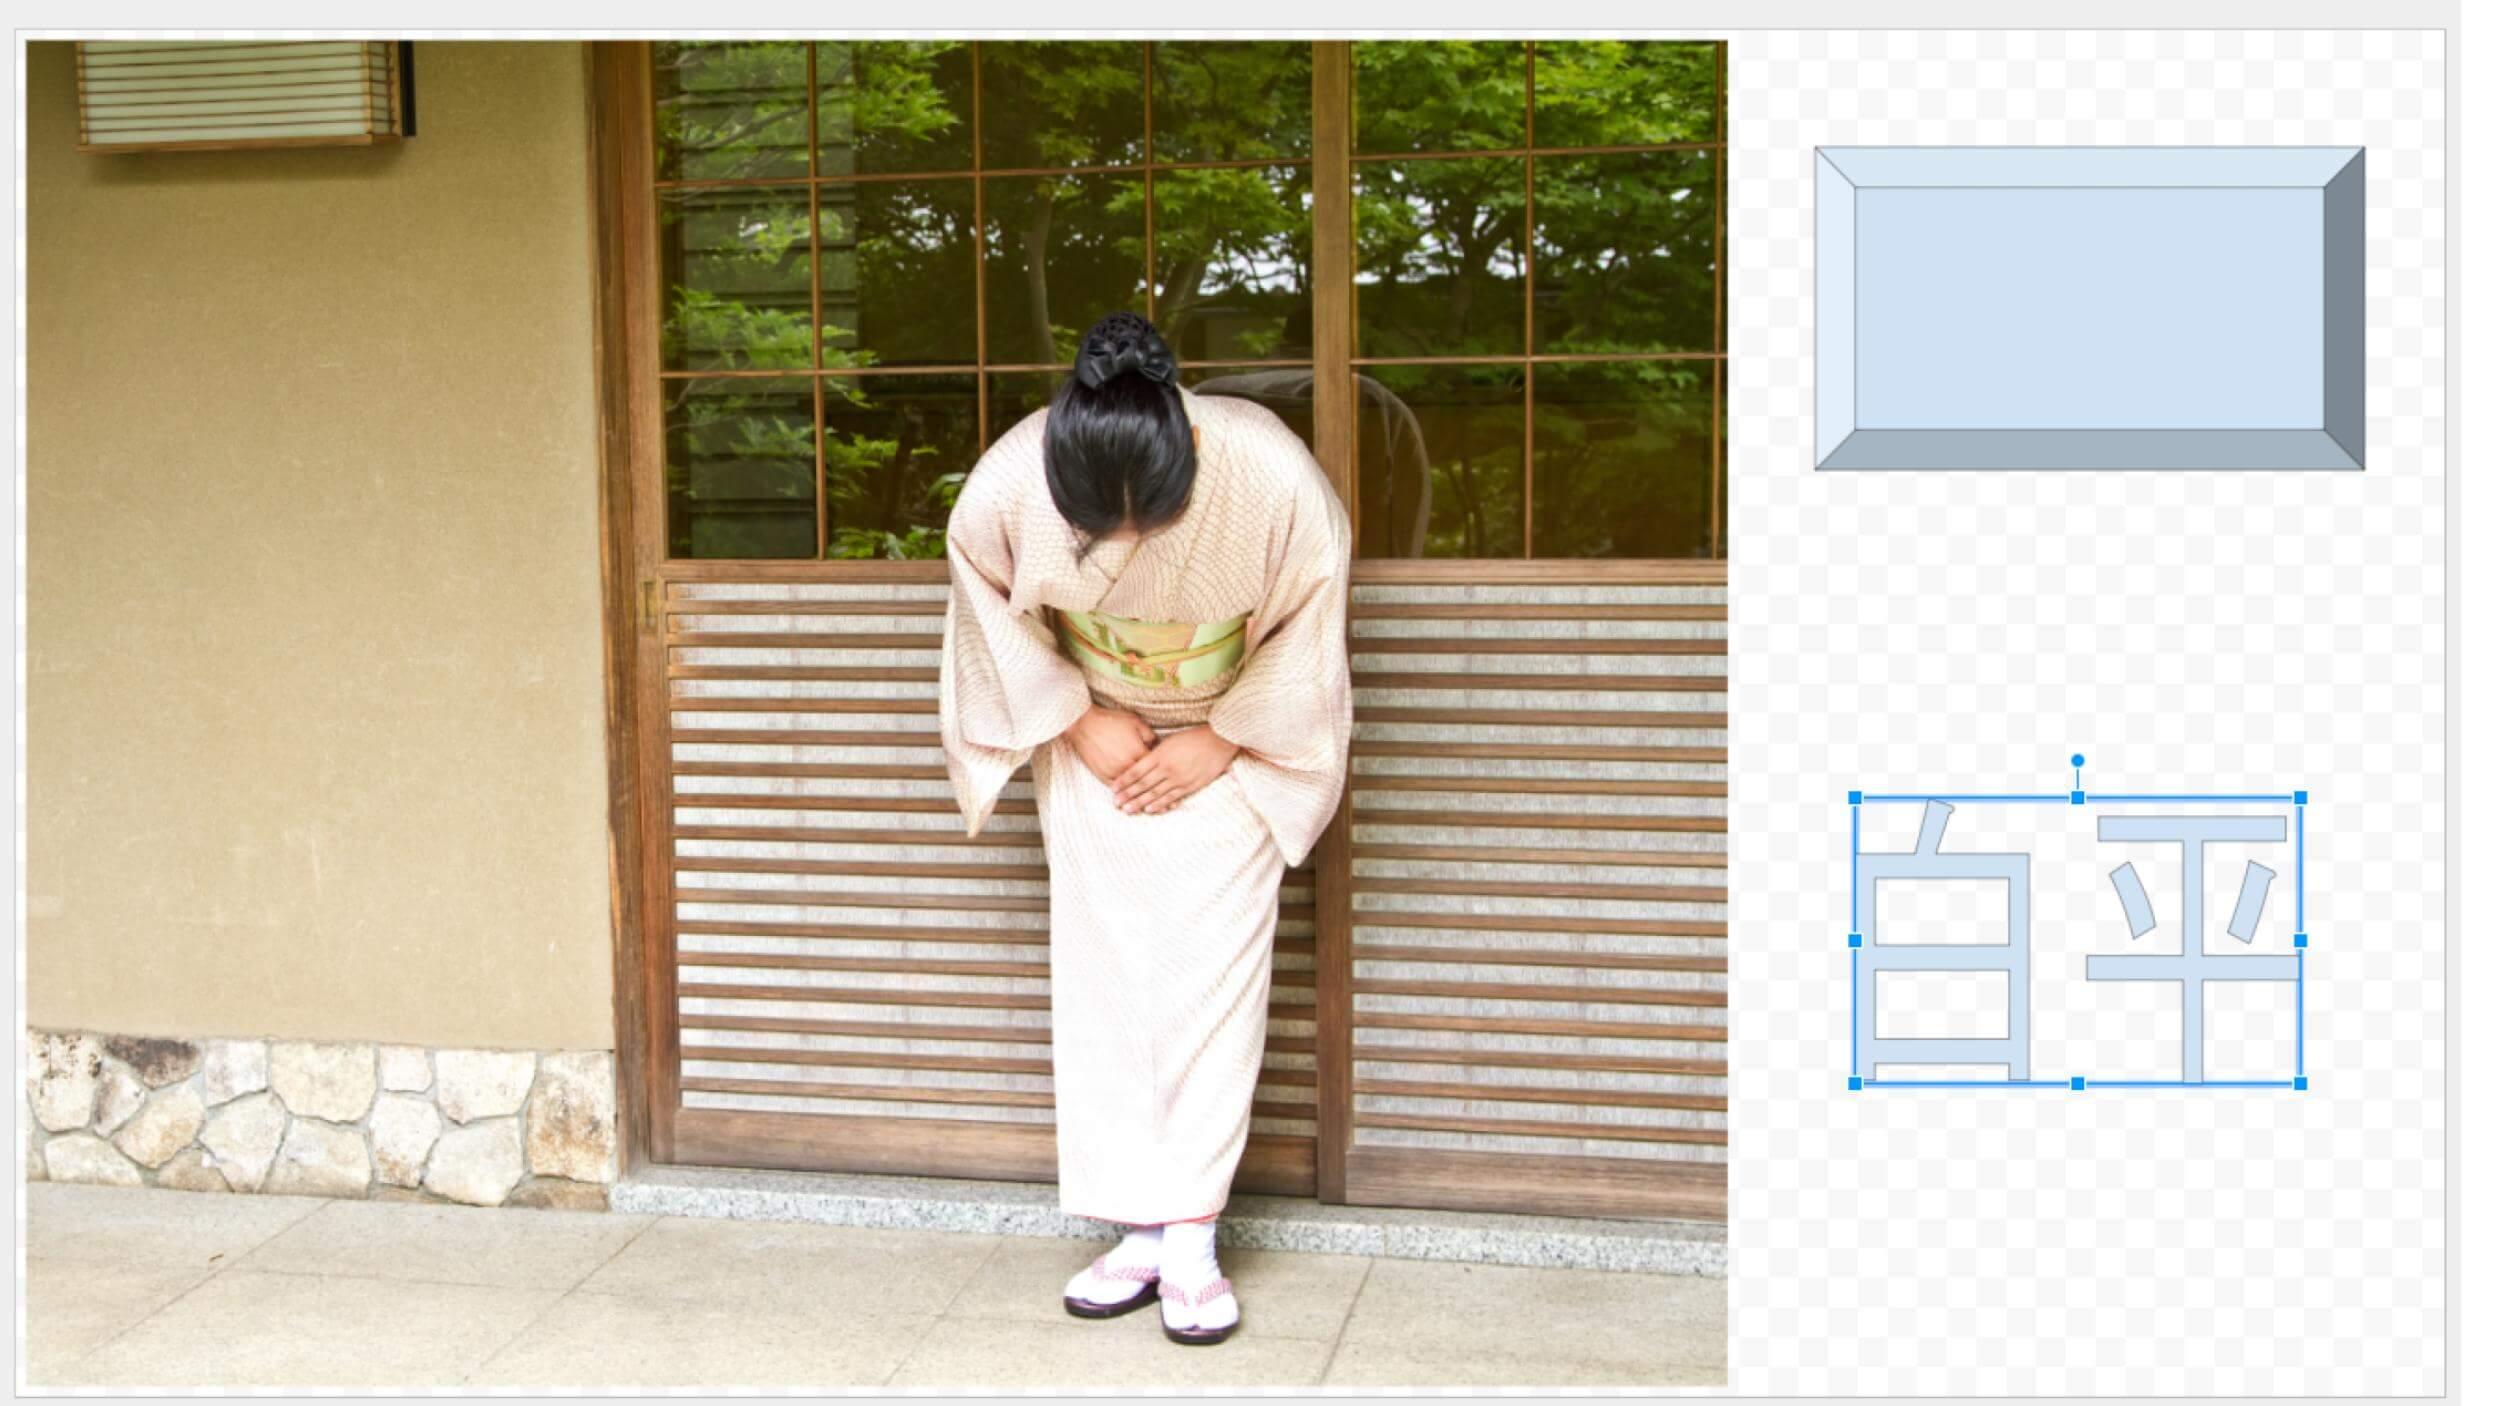 Google図形描画 玄関先で出迎える女将と四角形とワードアート・白平